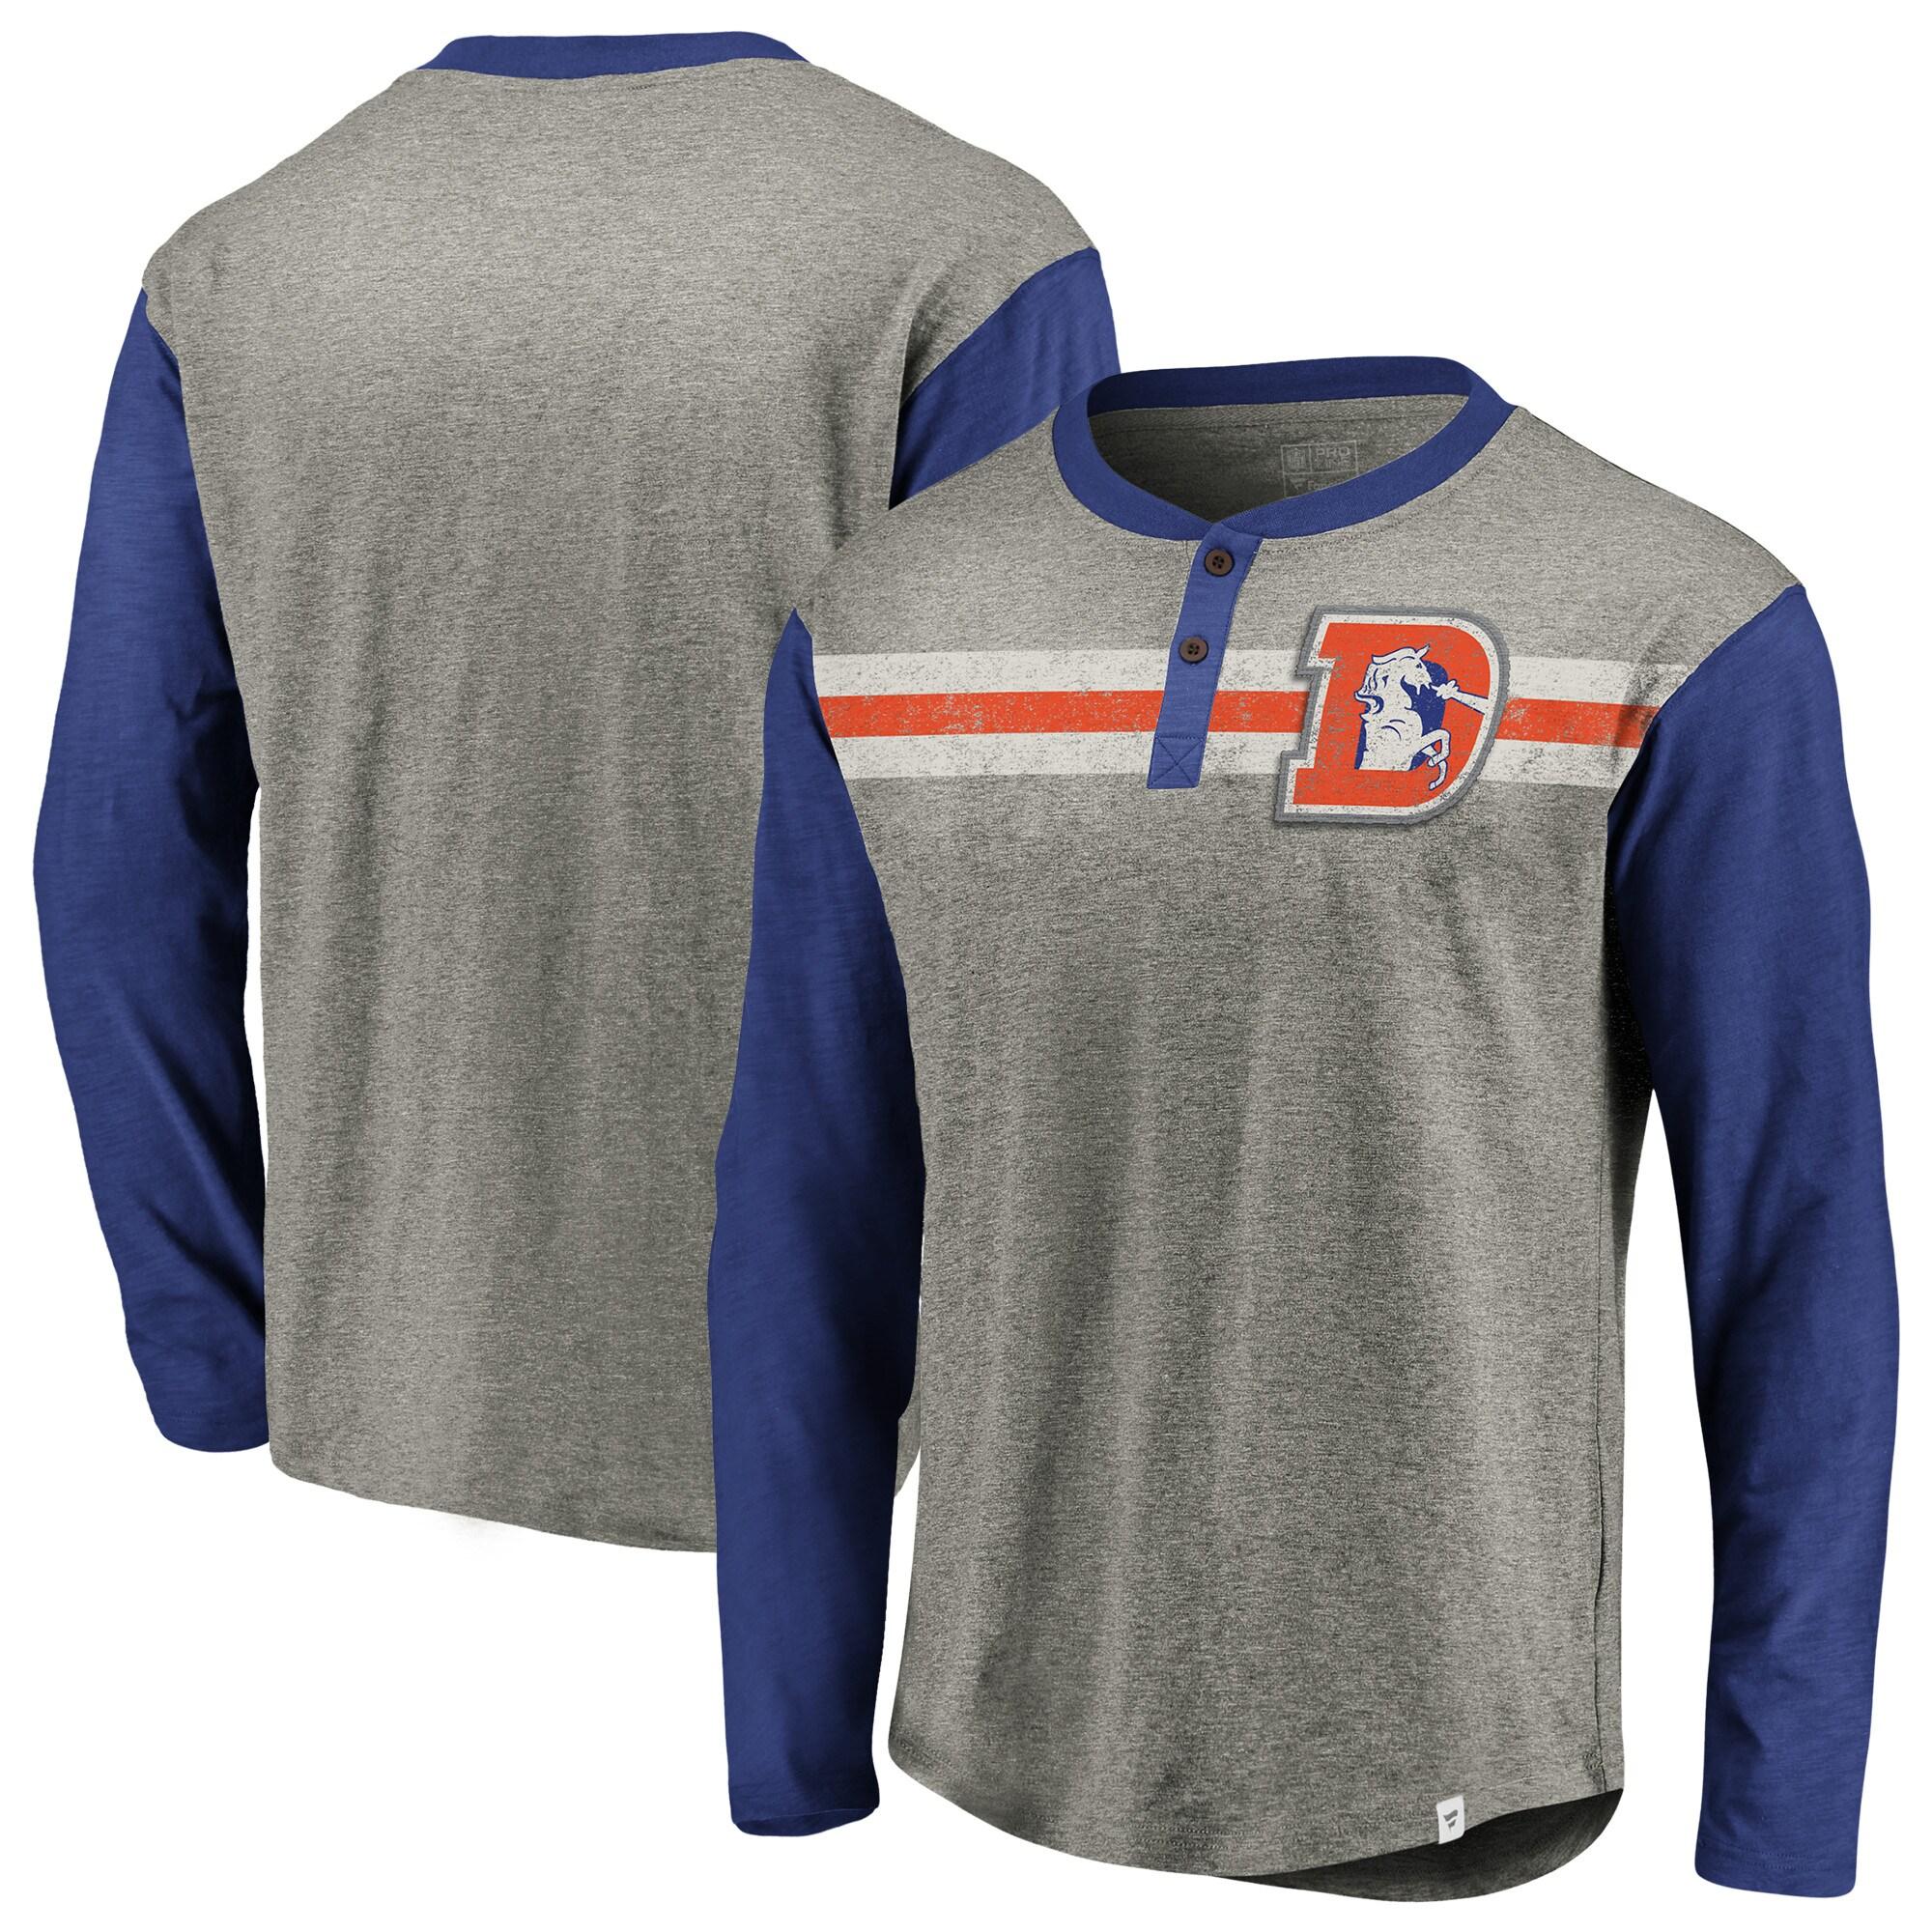 Denver Broncos NFL Pro Line by Fanatics Branded Big & Tall True Classics Henley Long Sleeve T-Shirt - Heathered Gray/Royal